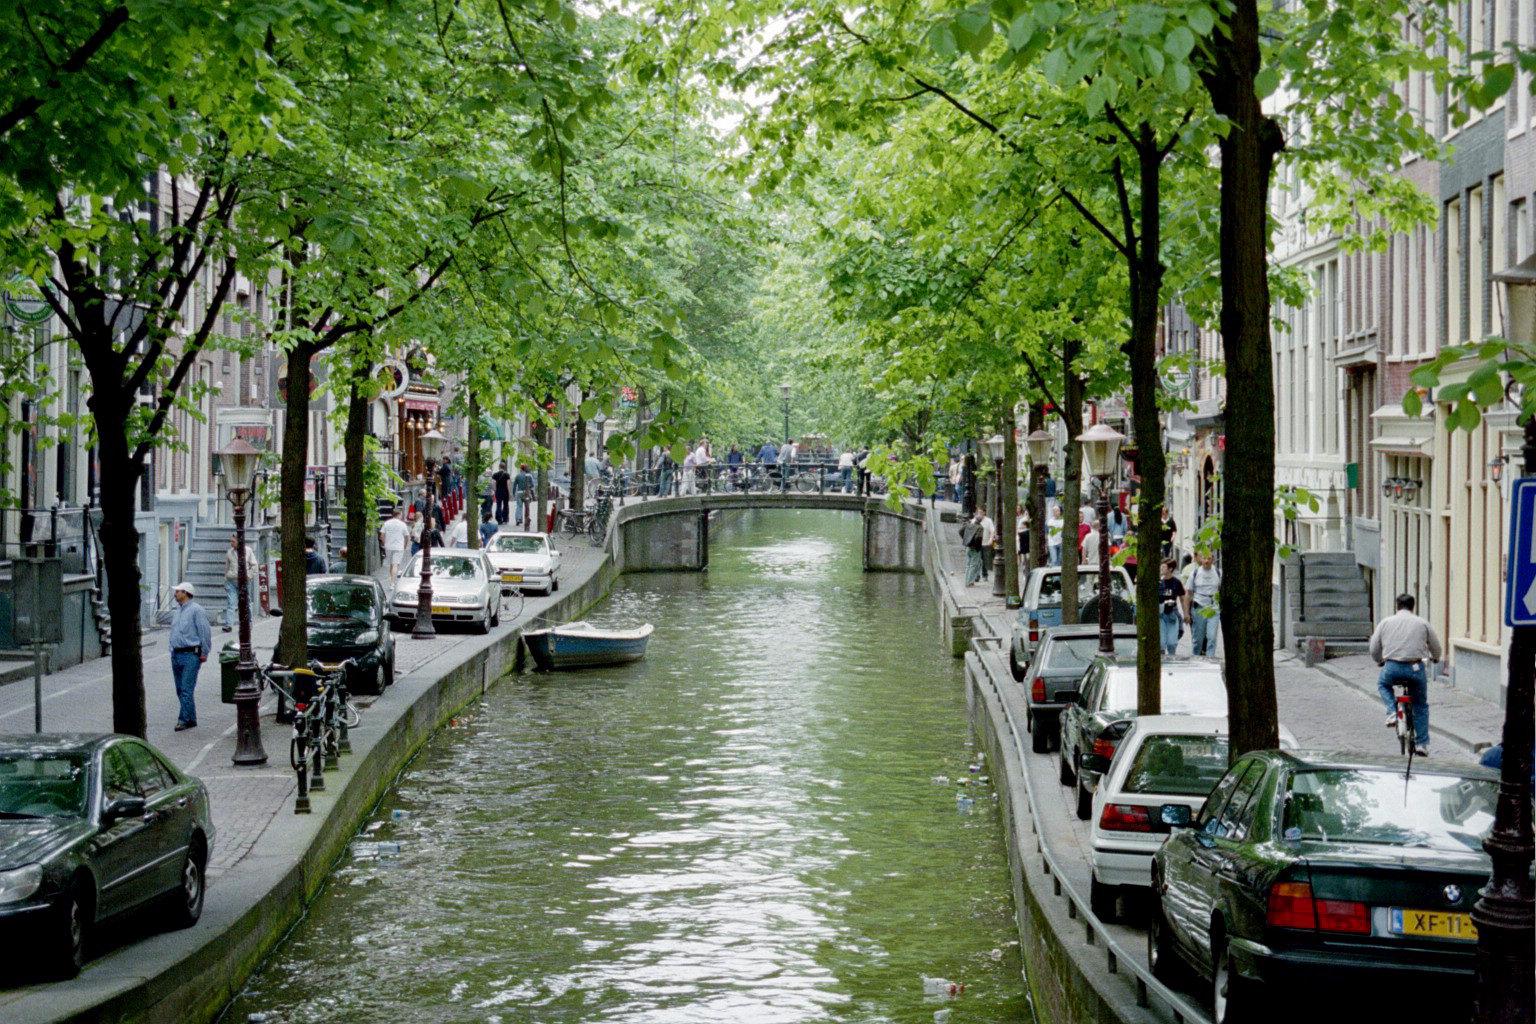 http://2.bp.blogspot.com/-KWqv6BN6MSE/TbZcVI5ue2I/AAAAAAAAAAU/MYLg9CrkPOE/s1600/amsterdam_canals12.jpg